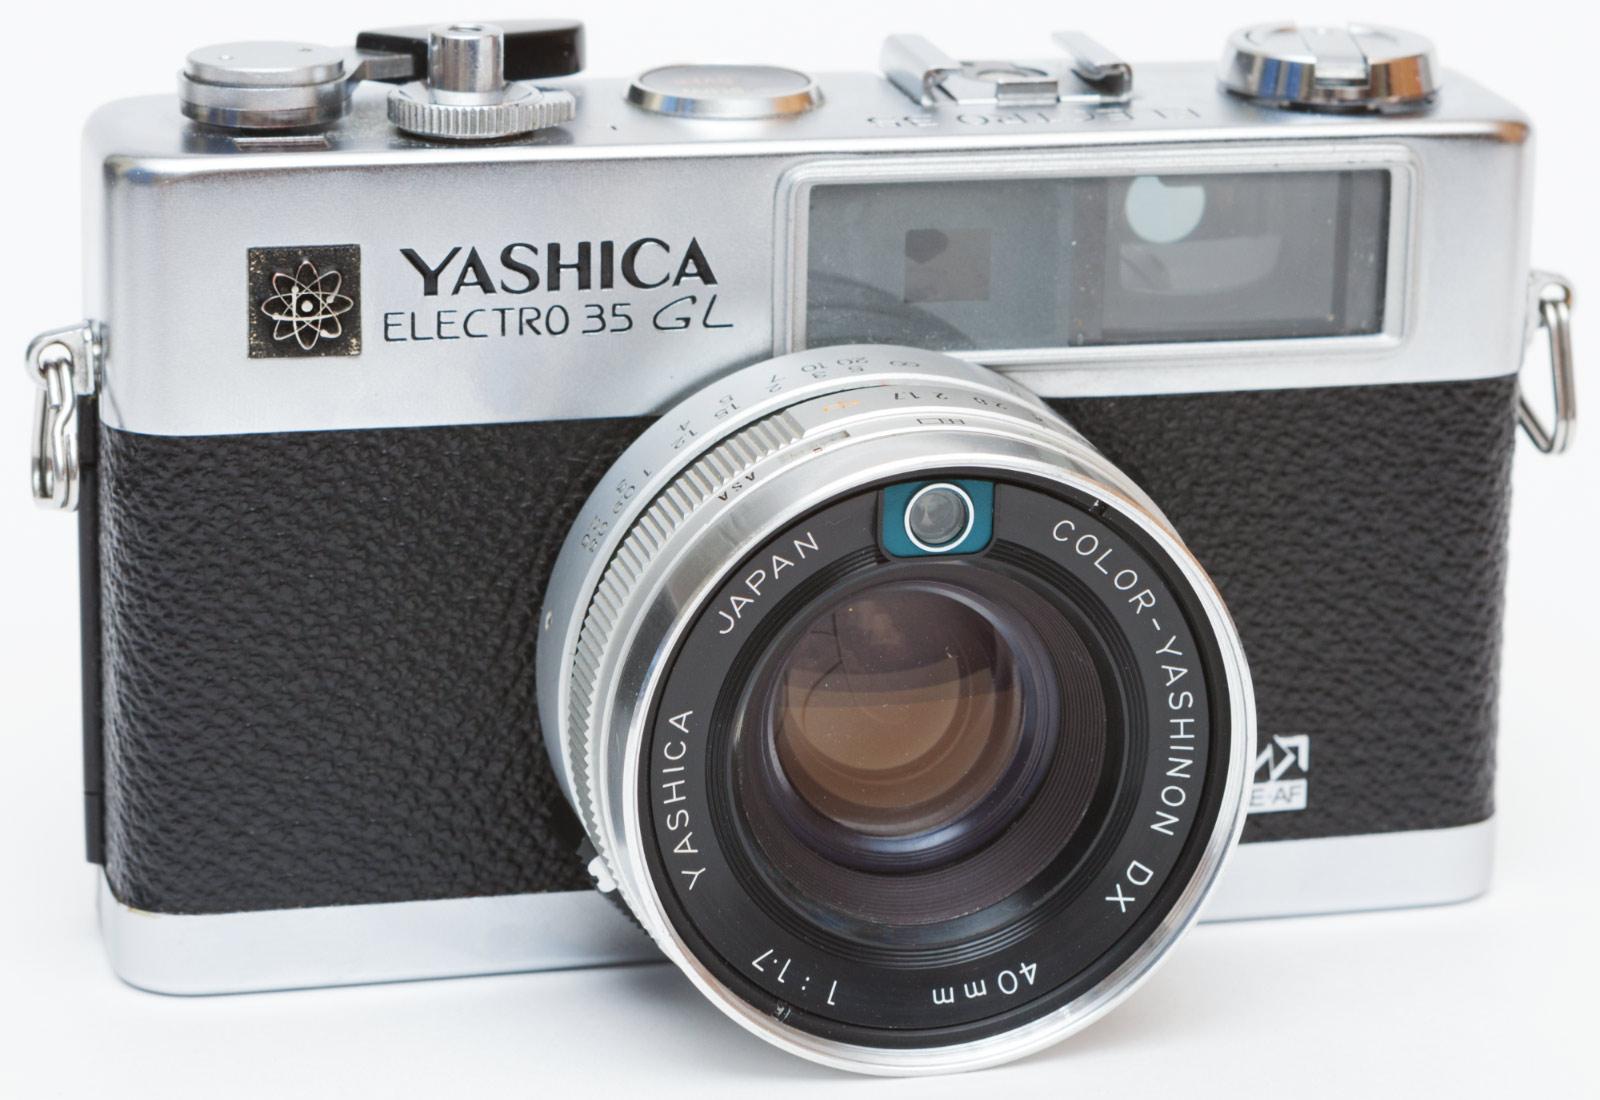 Yashica Electro 35 GL © Sasha Krasnov Photography